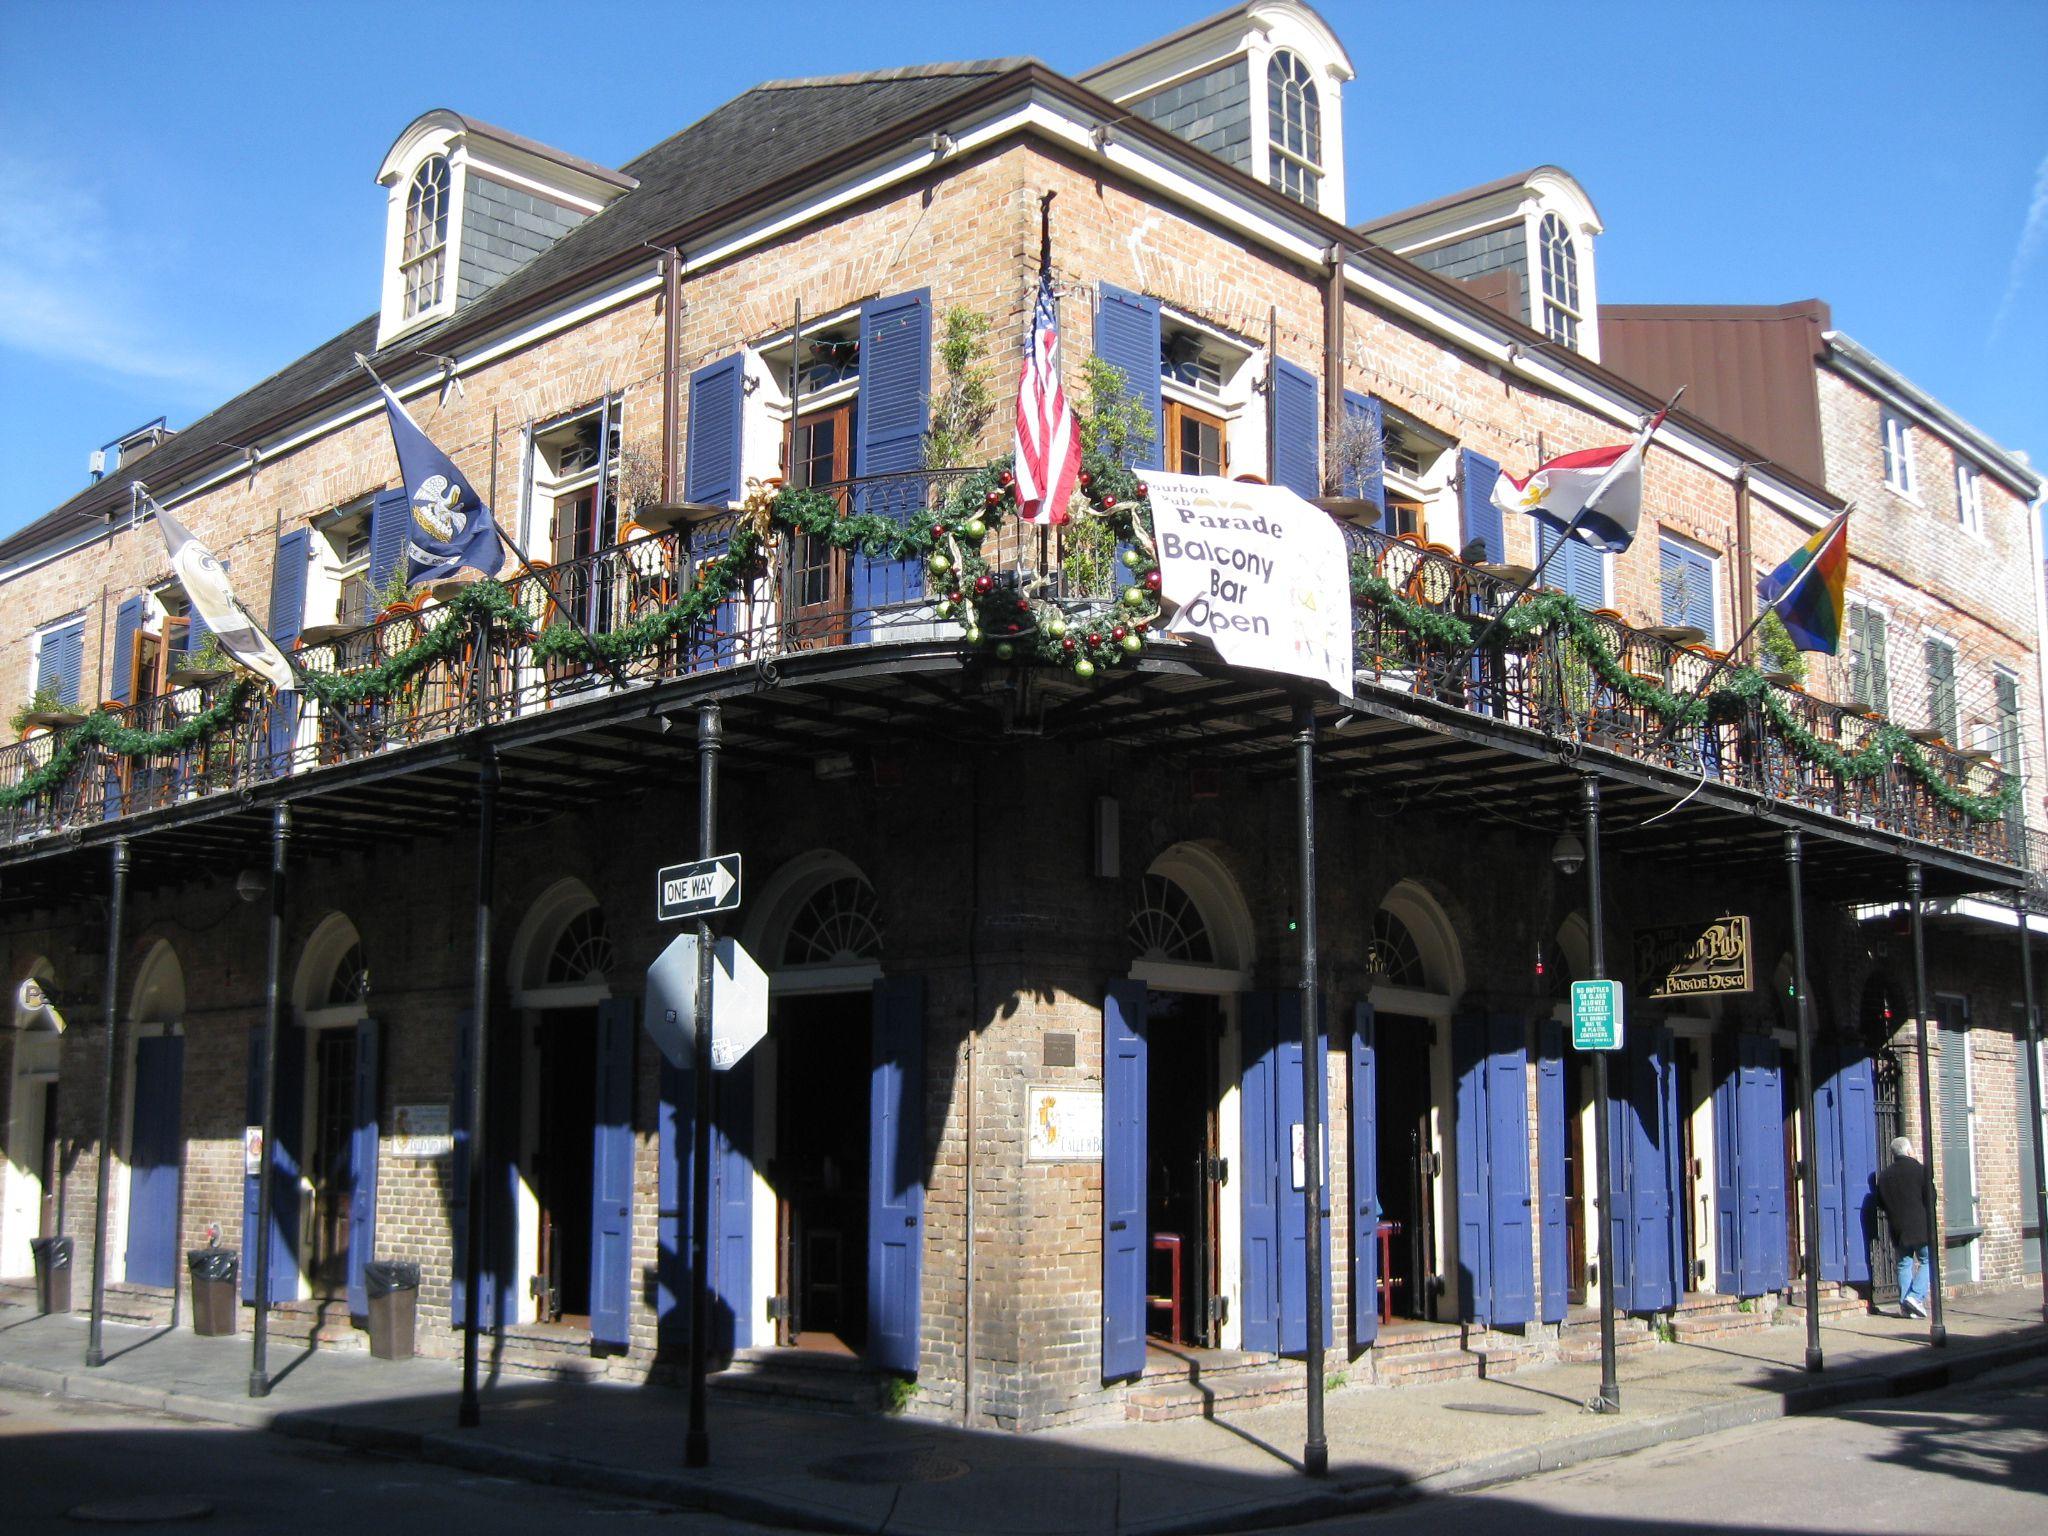 Gay sports bar's rooftop parties like bourbon street, neighbors say